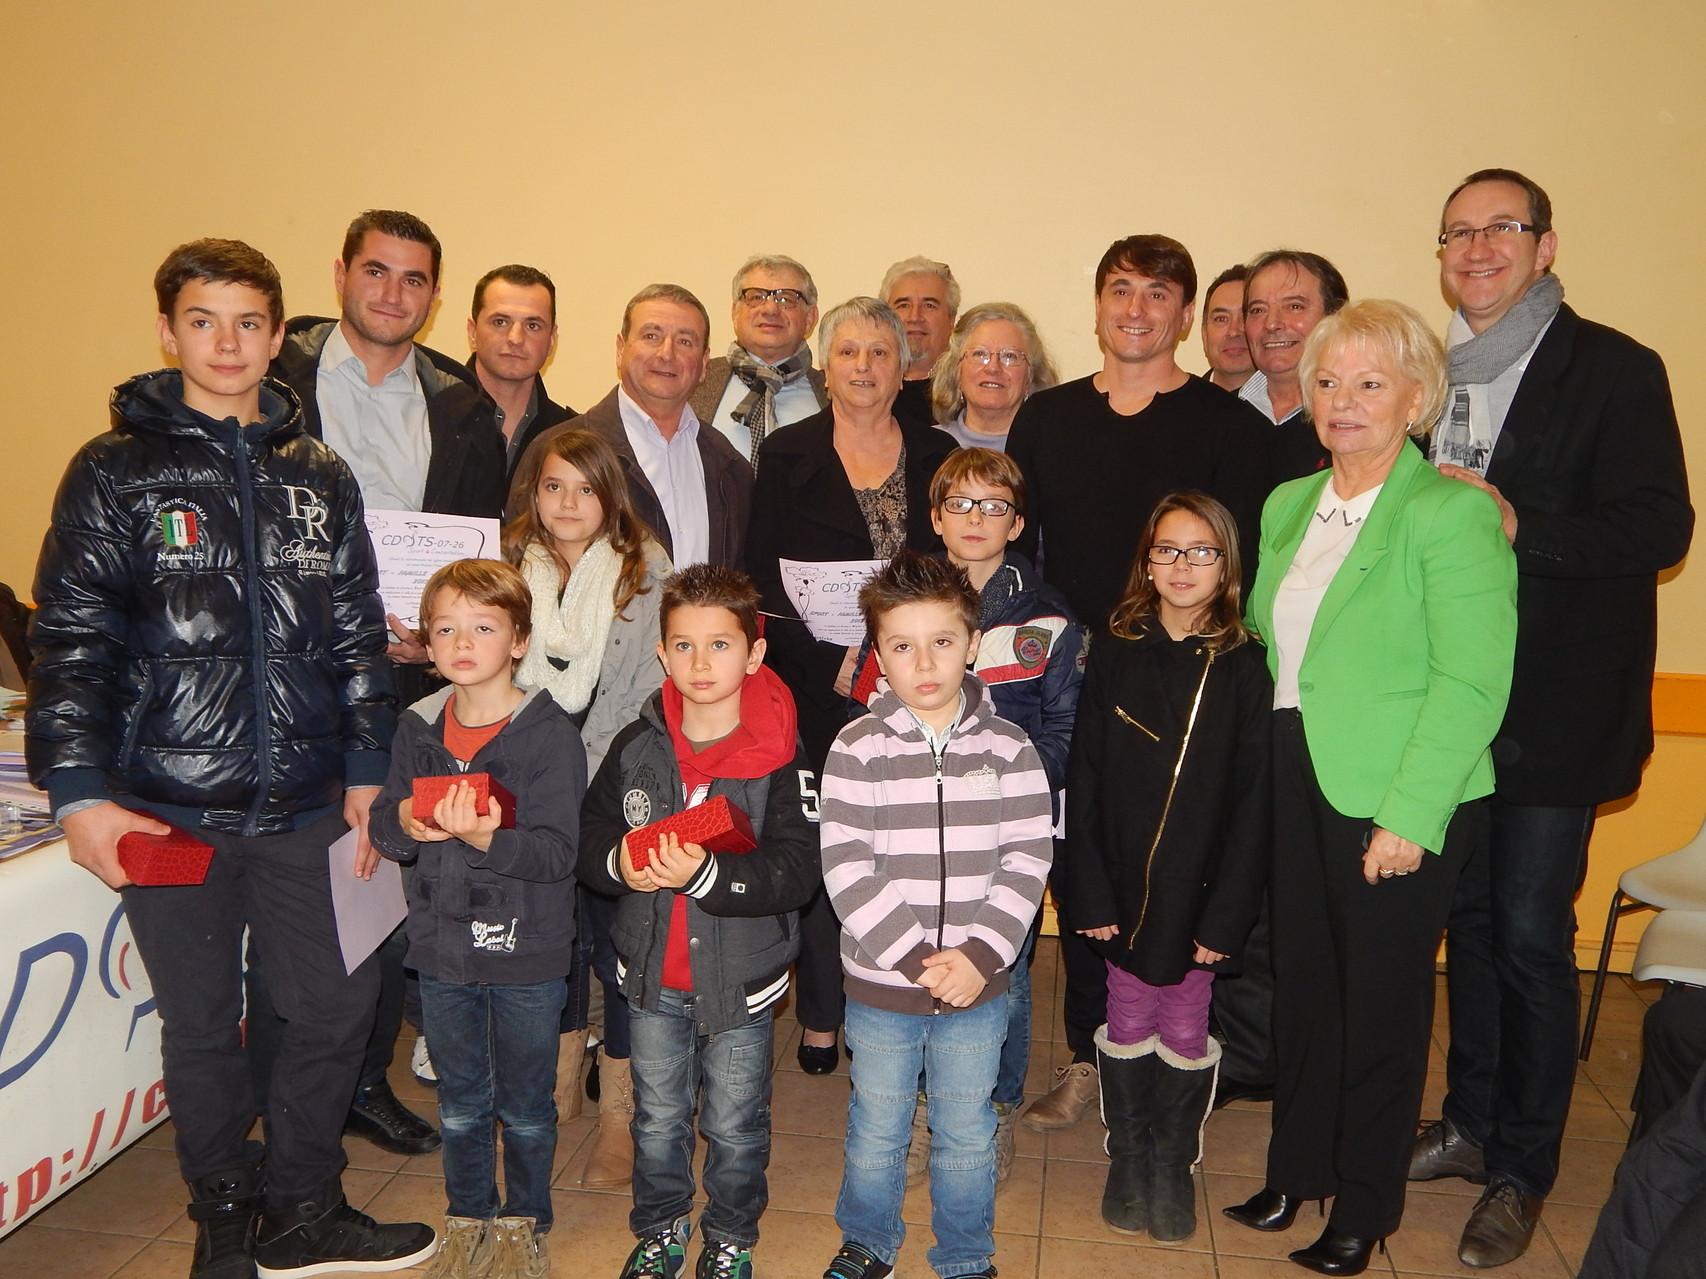 Famille Ponsot, O.Durand et Pierre-Jean Veyret